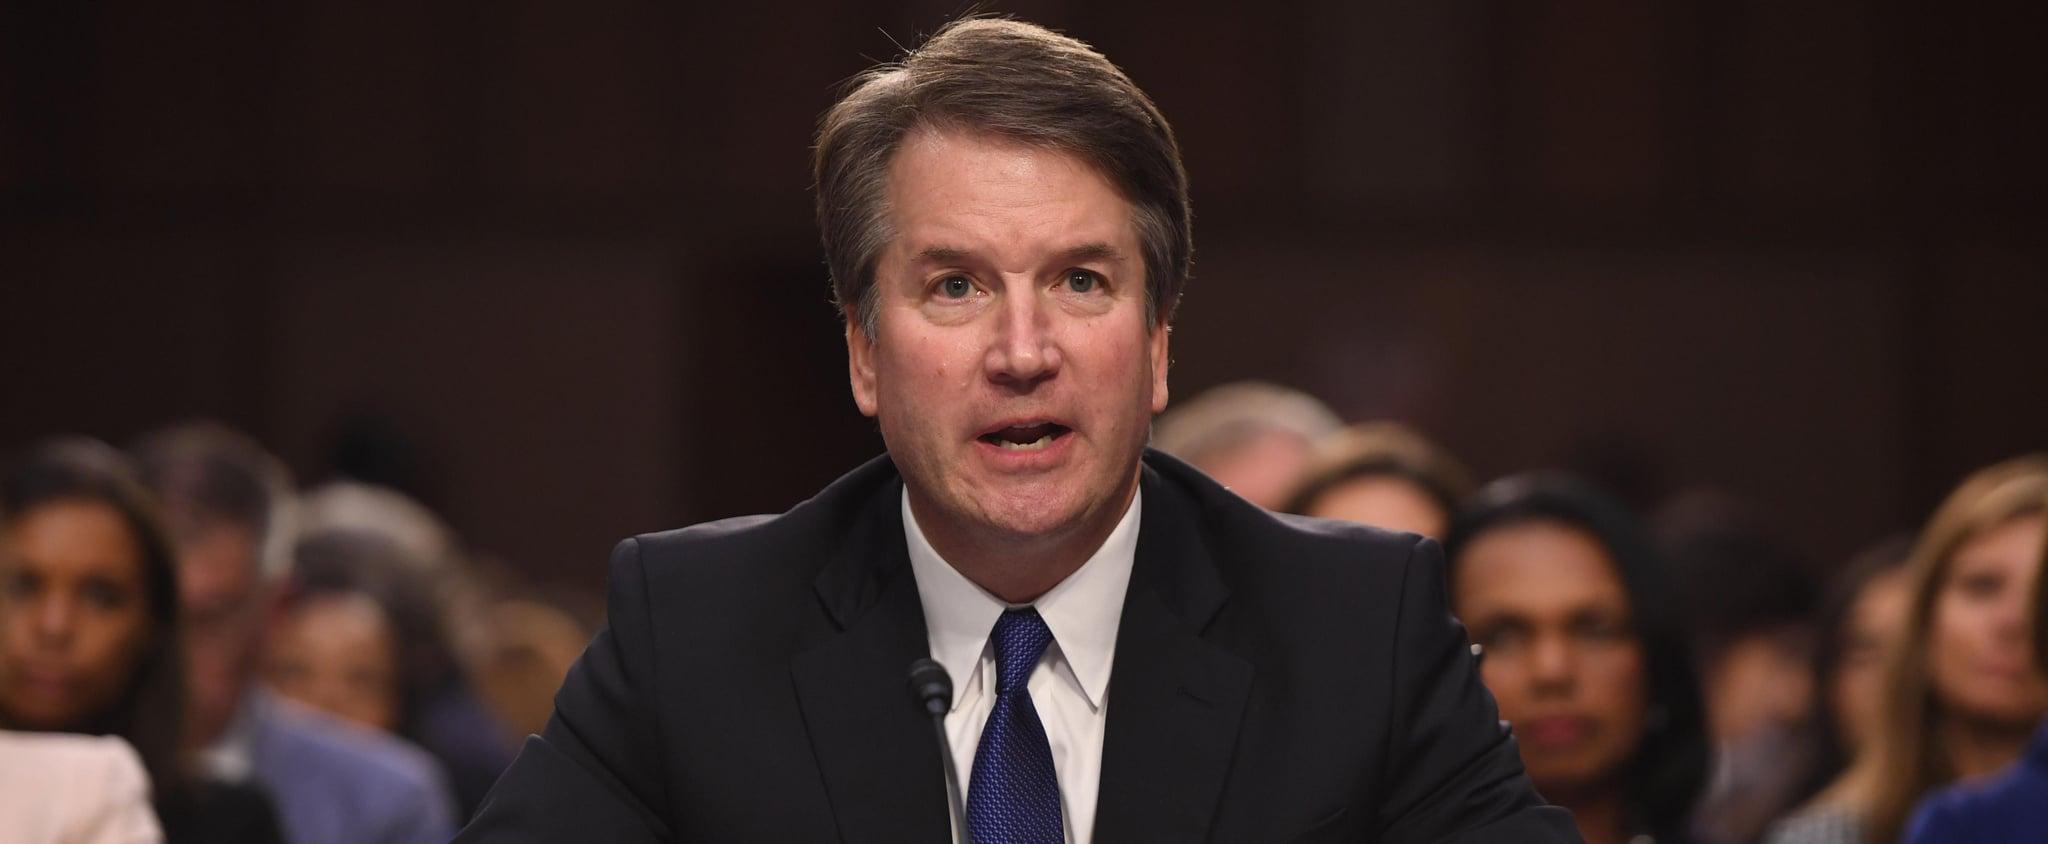 Brett Kavanaugh News and Sexual Assault Allegation